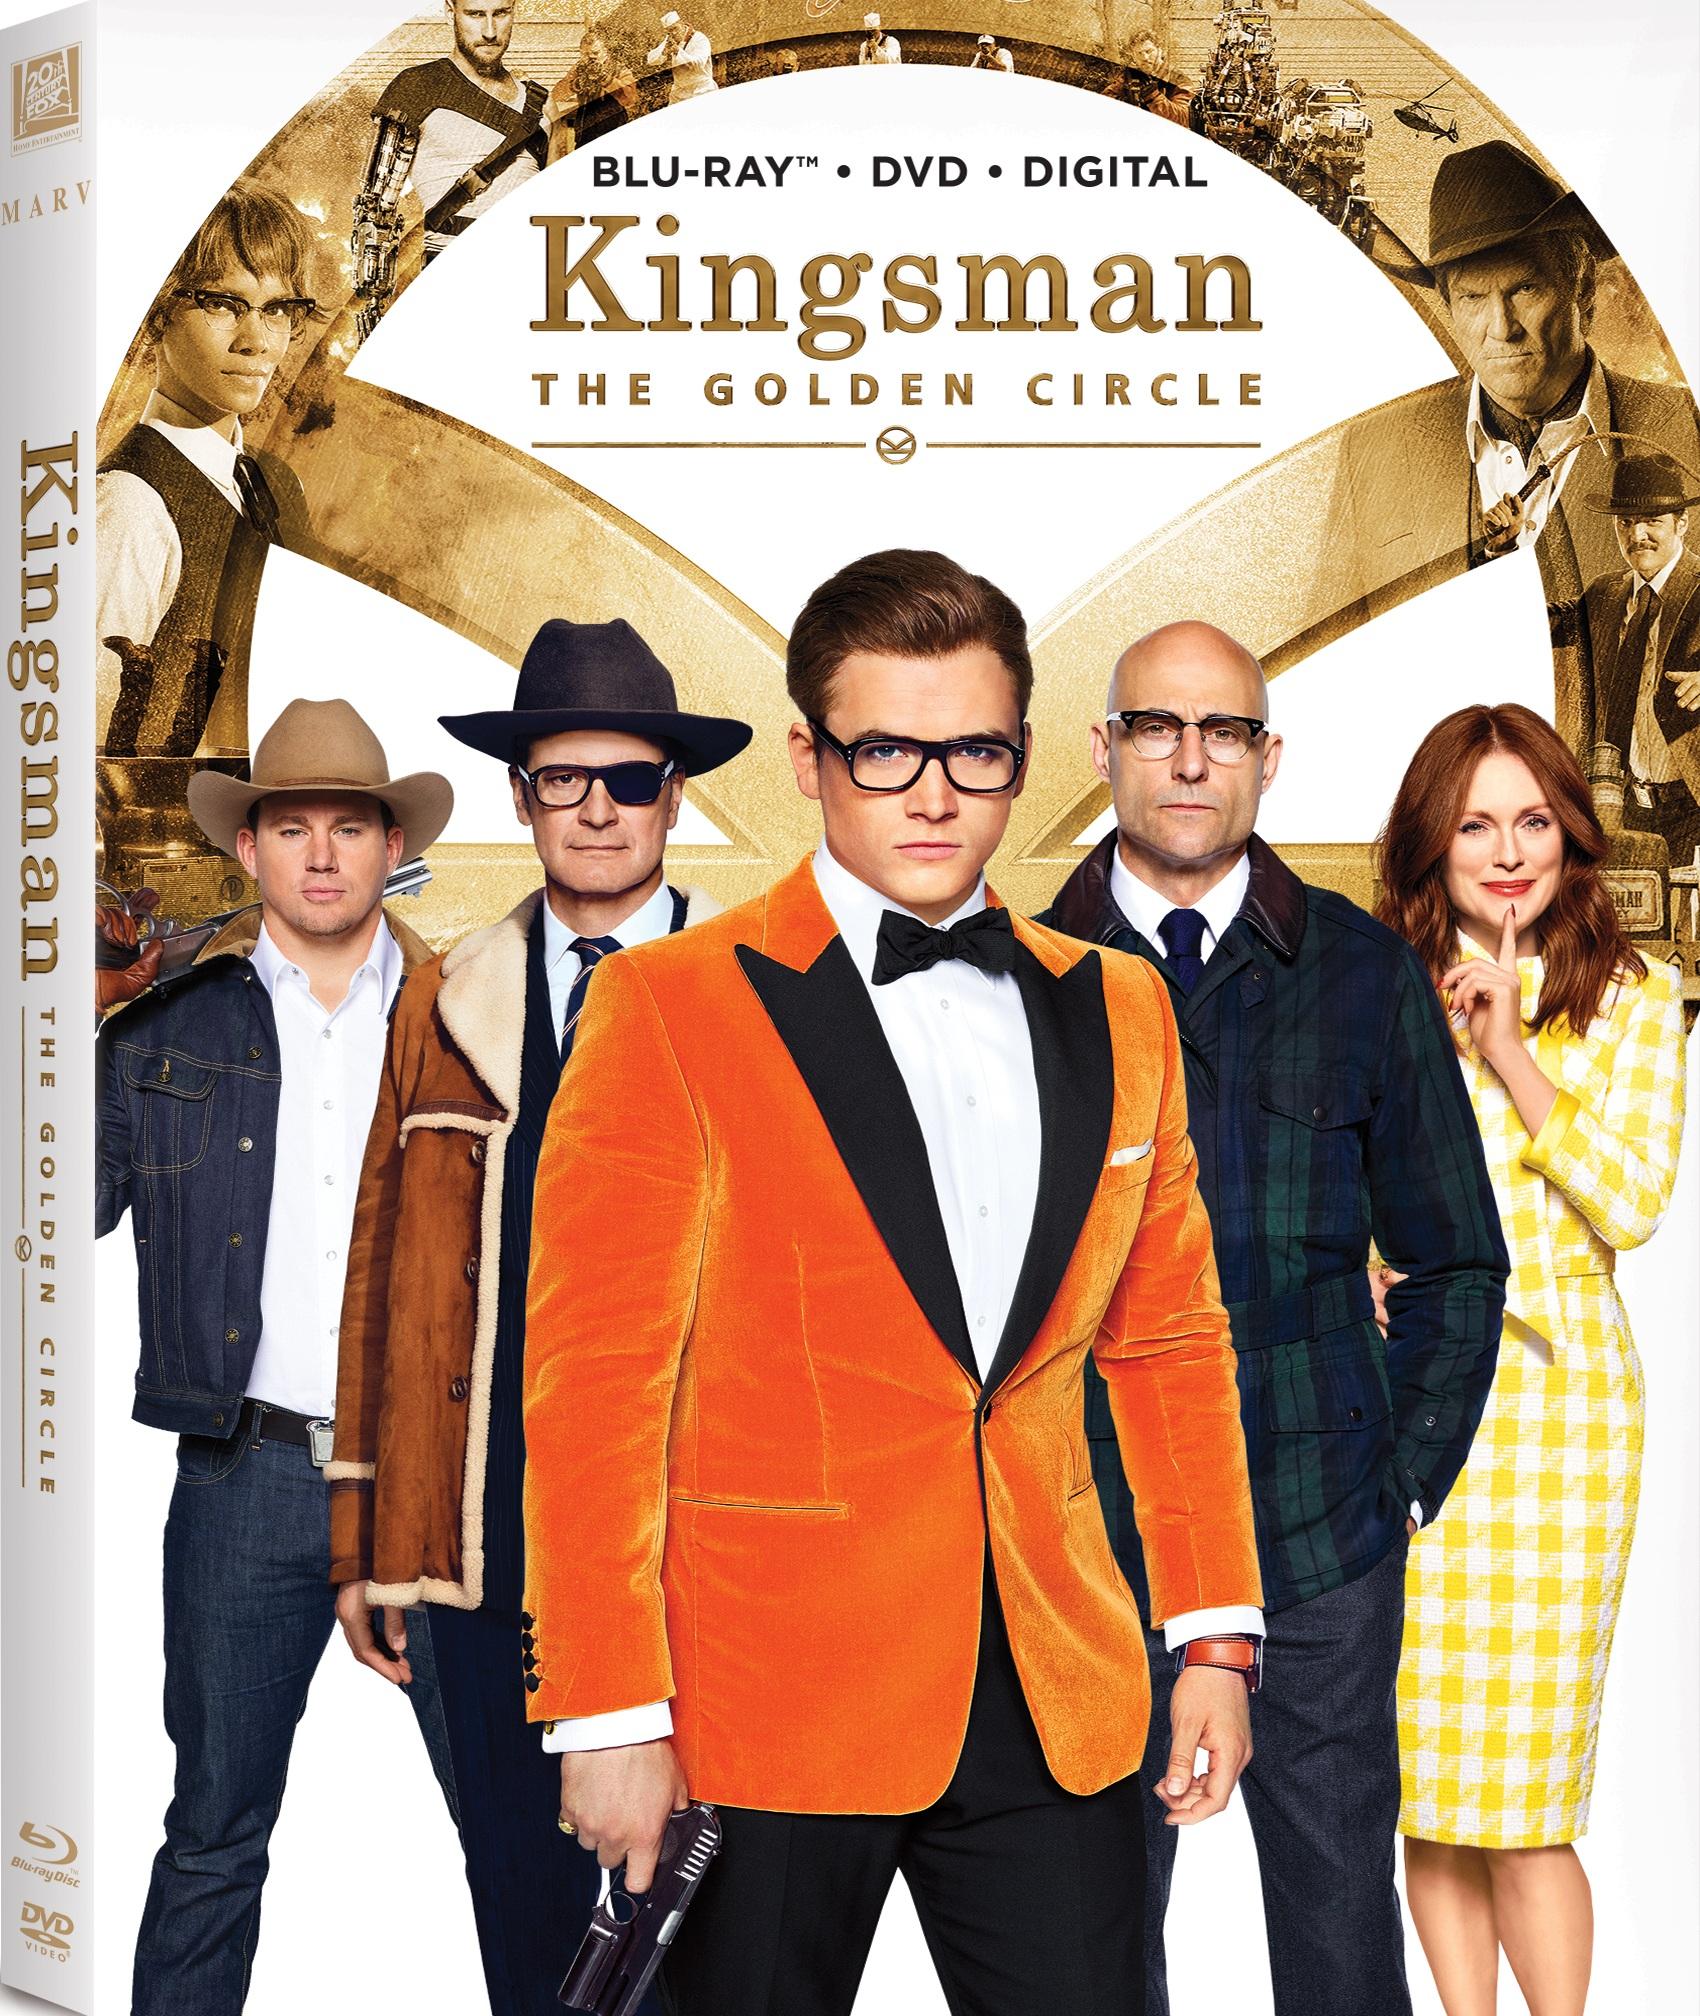 Kingsman 2 (Blu-ray + Dvd + Digital)